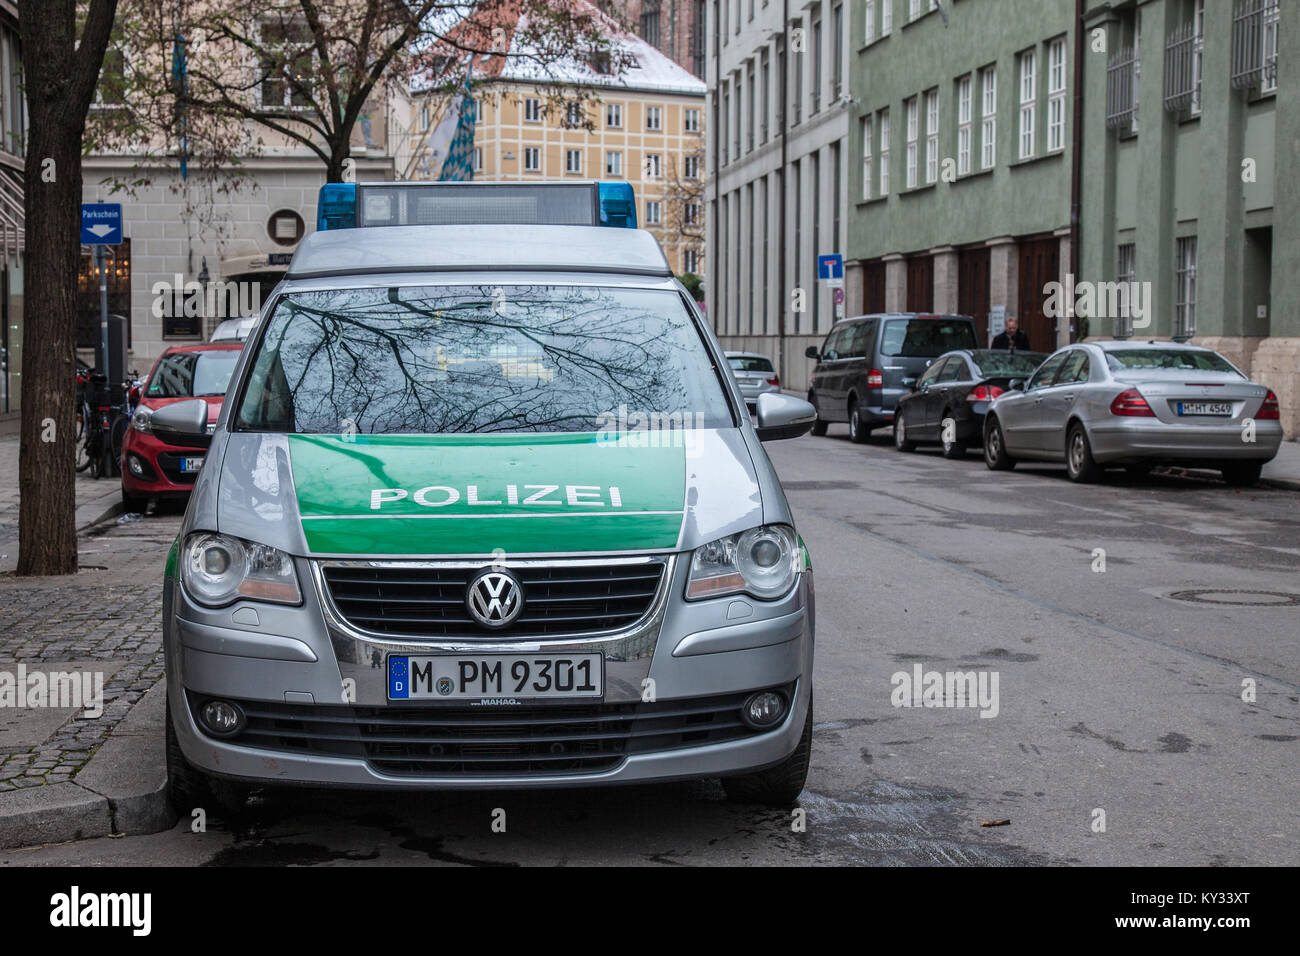 MUNICH, GERMANY - DECEMBER 18, 2017: Volkswagen from the Bavarian State police (polizei) taken in Munich. The Bavarian - Stock Image